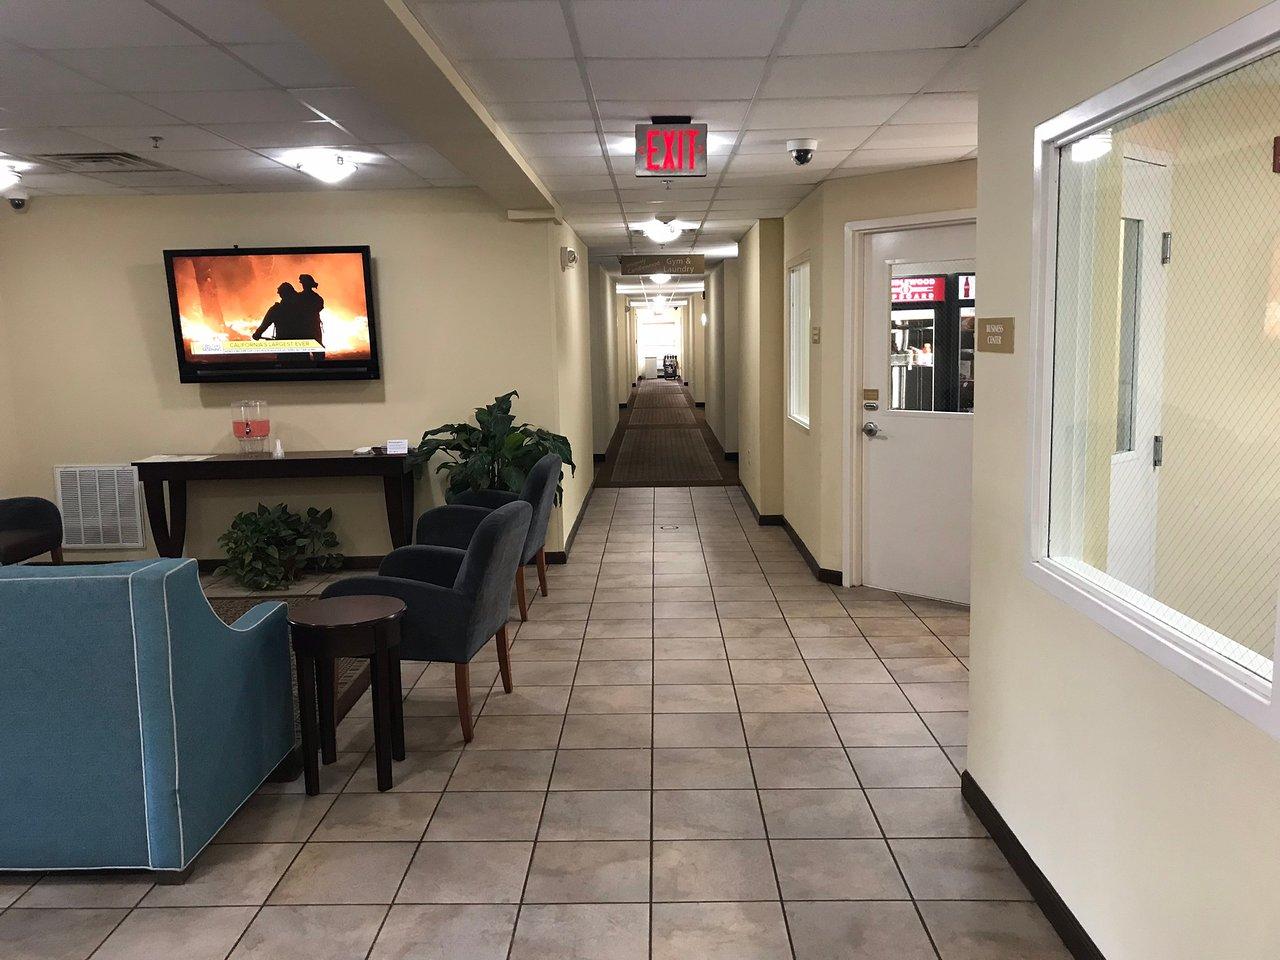 candlewood suites jacksonville 85 1 8 0 updated 2019 prices rh tripadvisor com